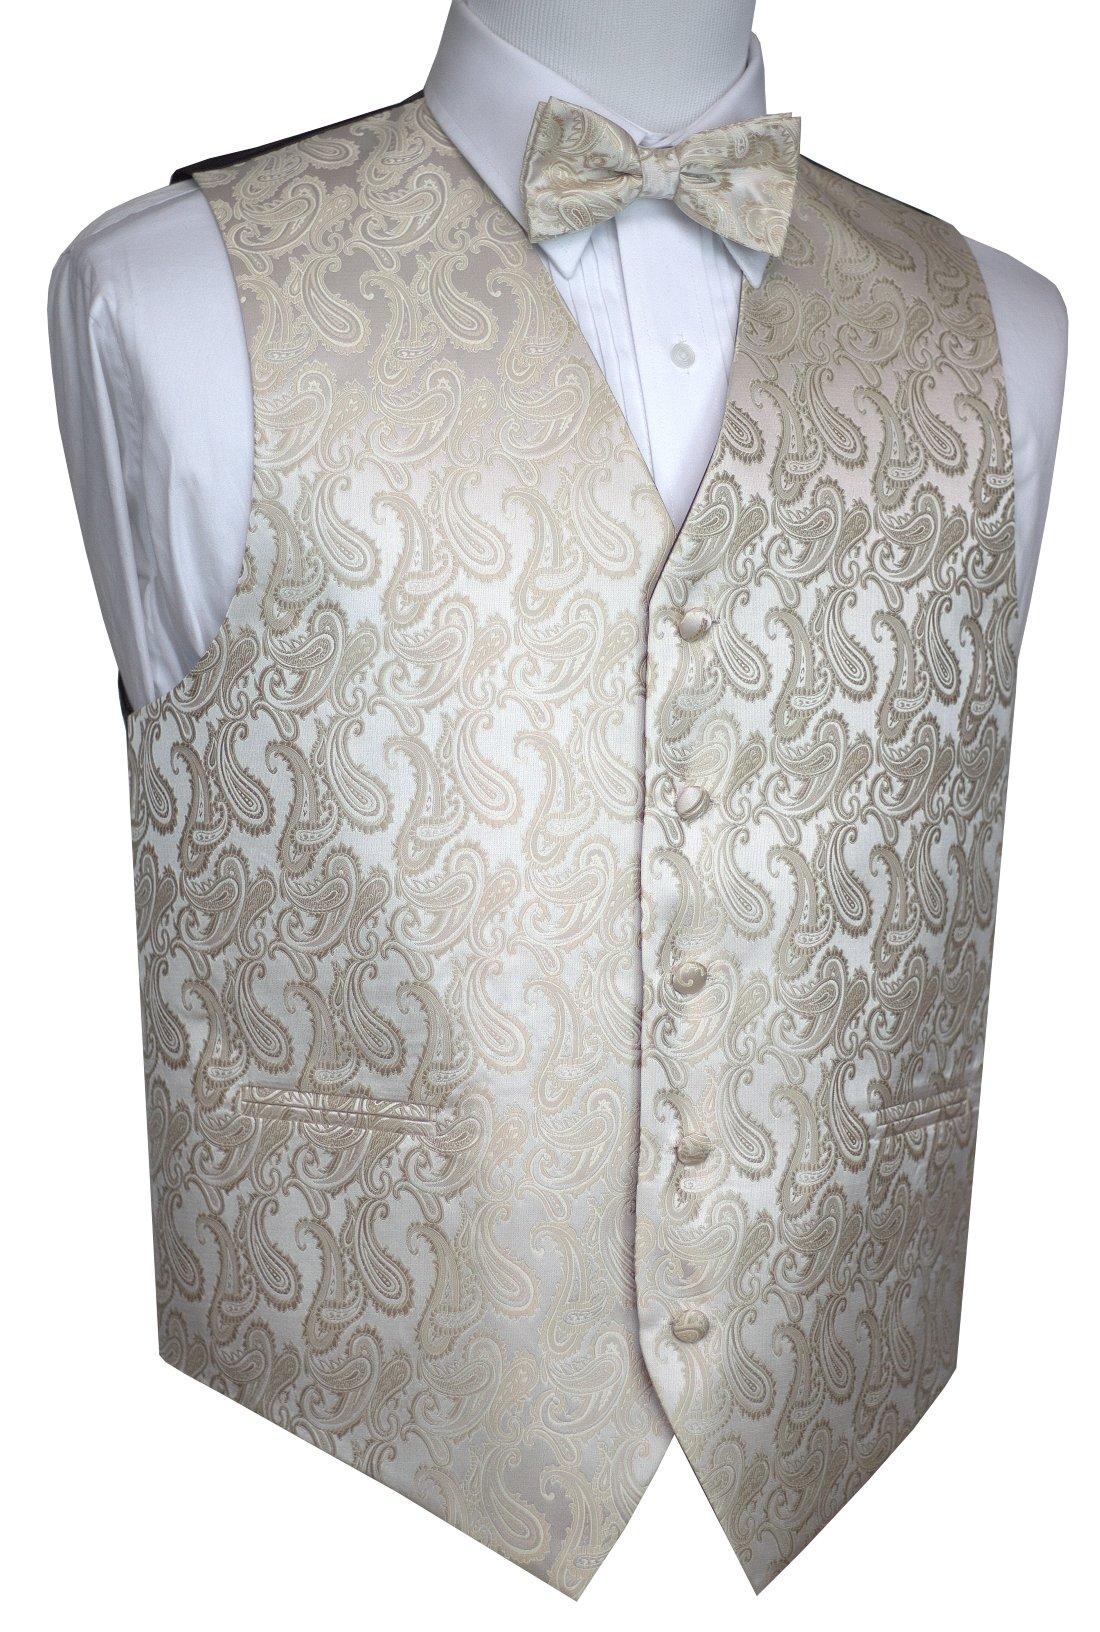 Brand Q Men's Formal, Wedding, Prom, Tuxedo Vest & Bow-Tie Set-Champagne Paisley-L by Brand Q (Image #1)